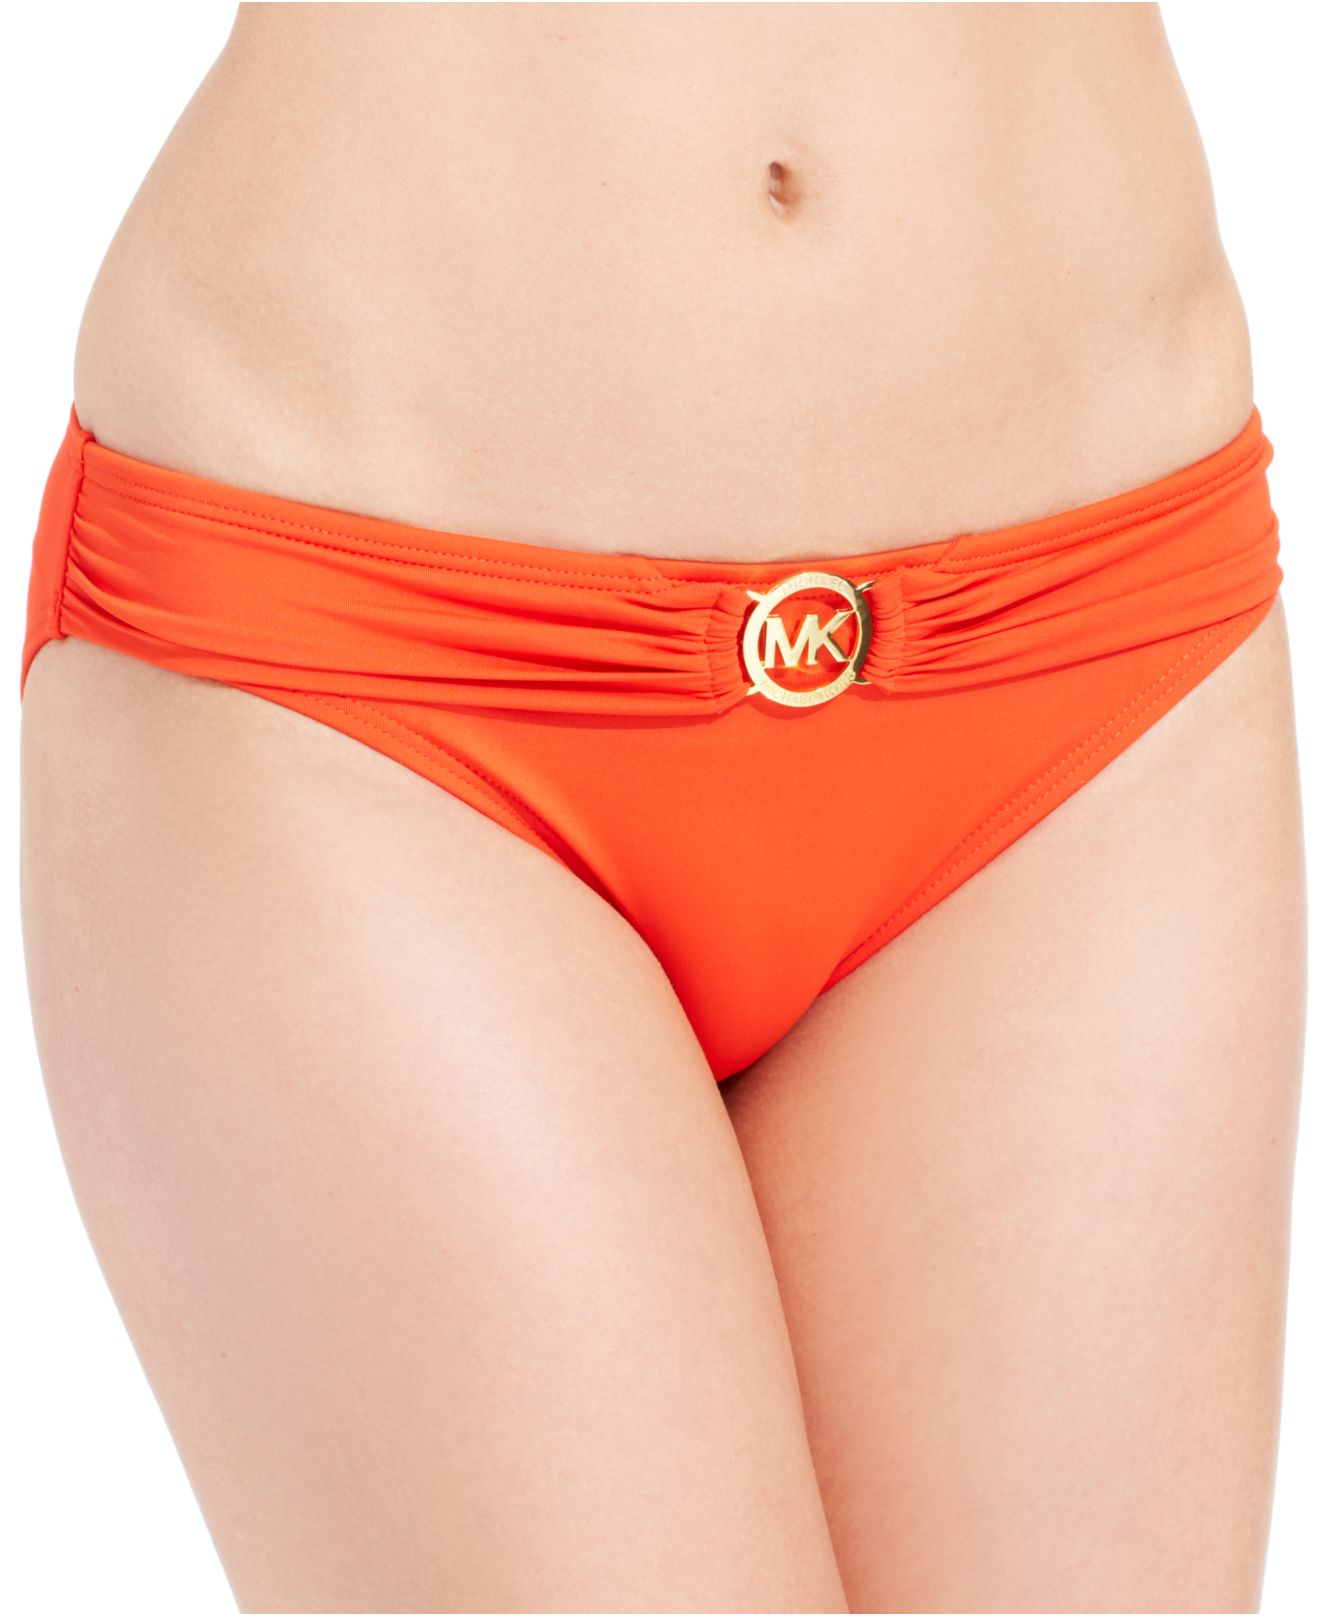 ba9779ebfb3d5 Lyst - Michael Kors Michael Solid Logo Bikini Bottom in Orange